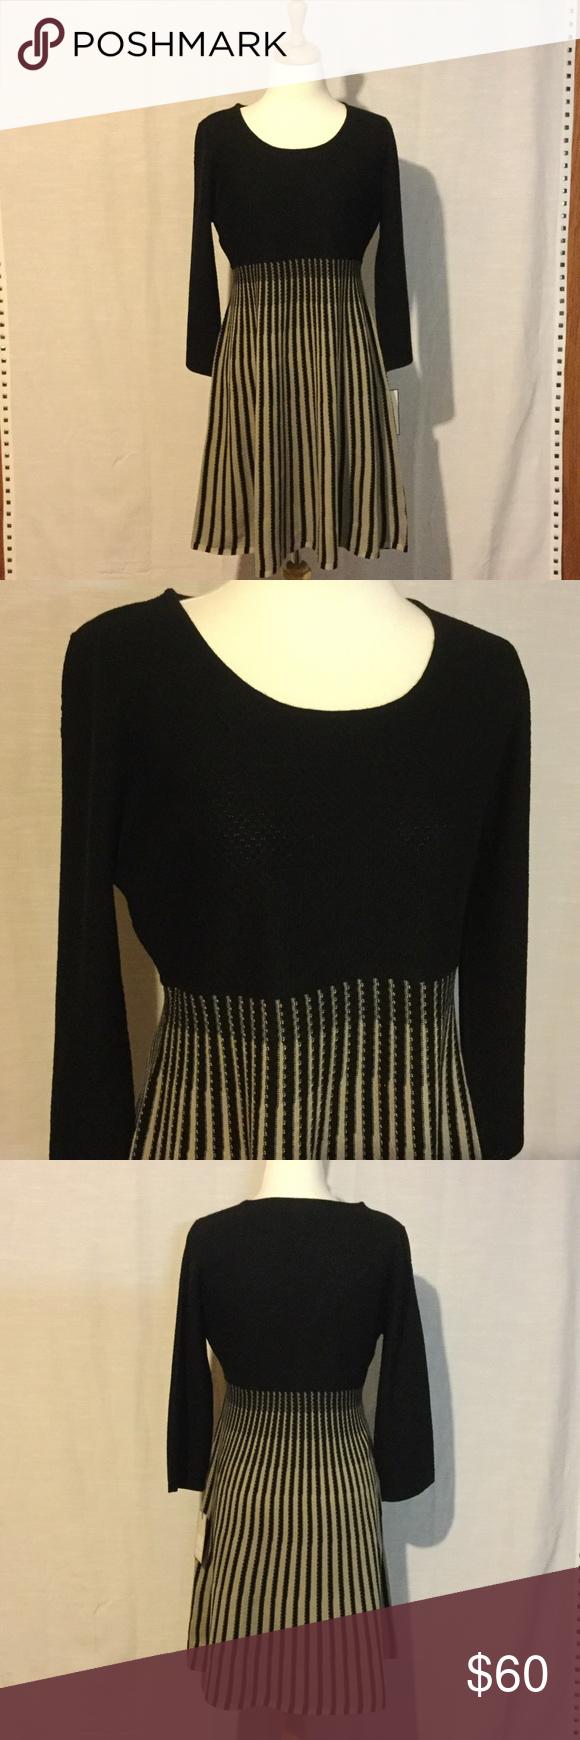 Dana buchman black and khaki aline dress nwt knit skirt black